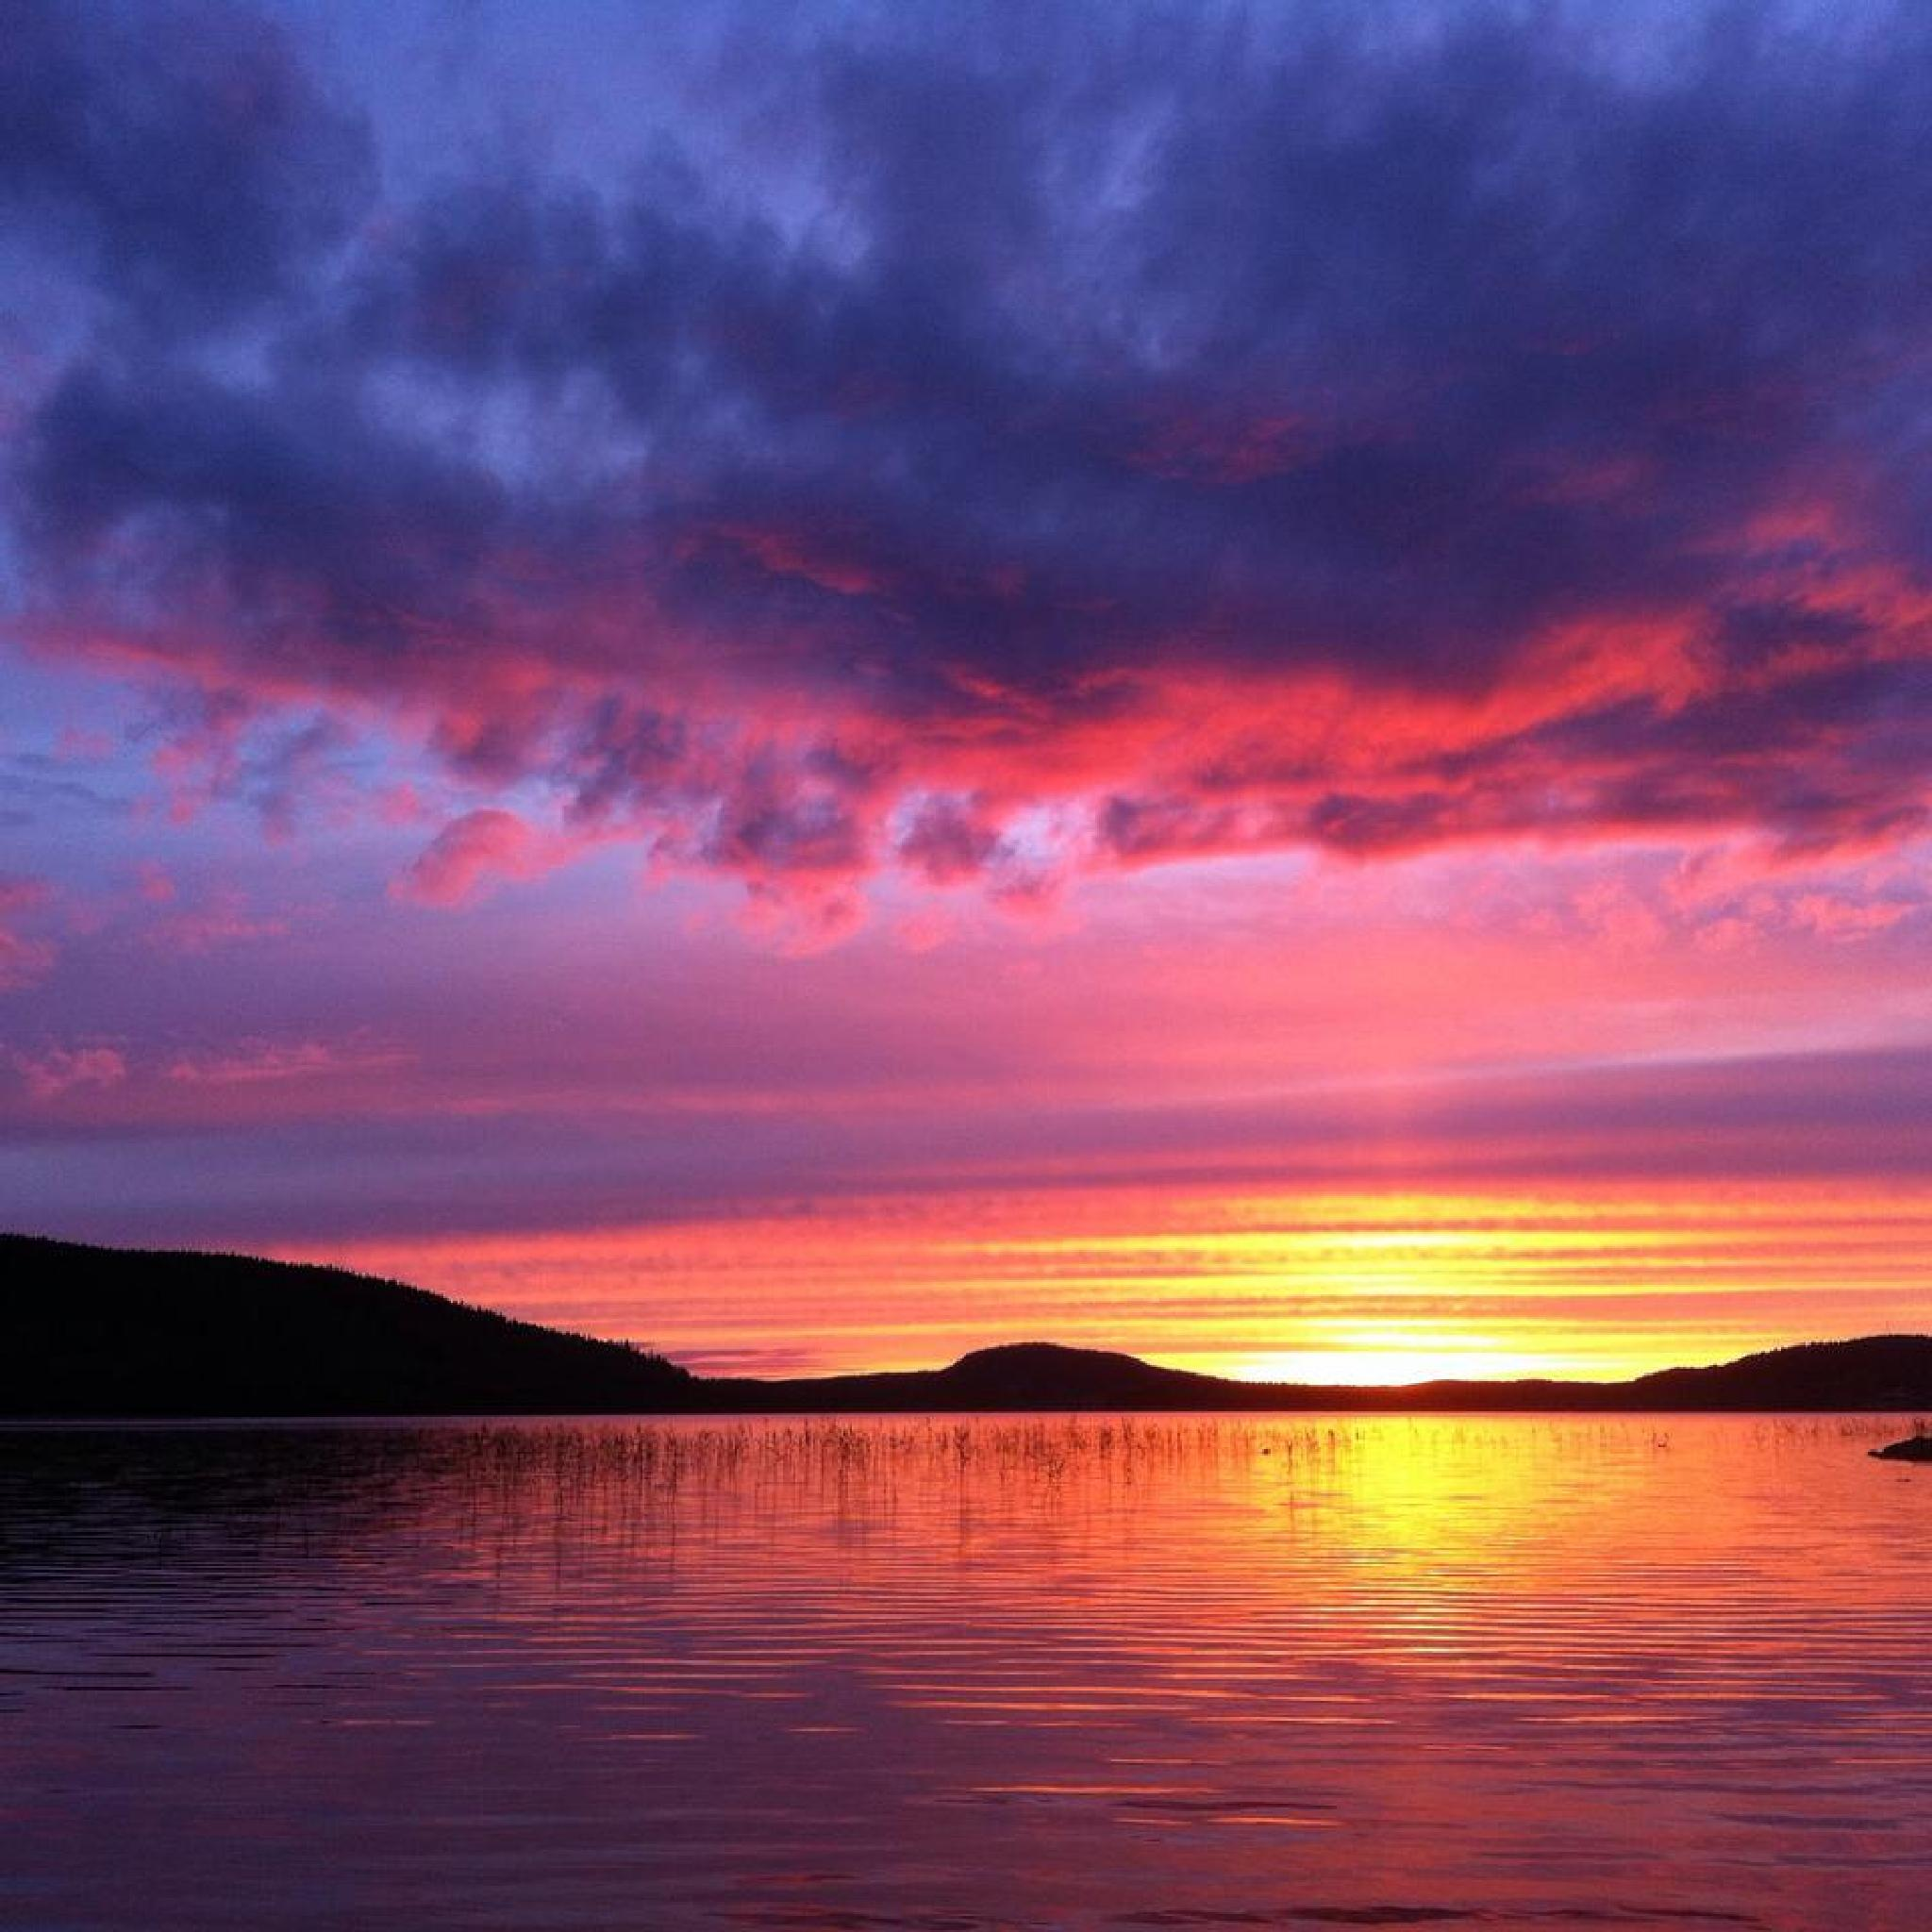 Late evening by Birgith Haraldsson